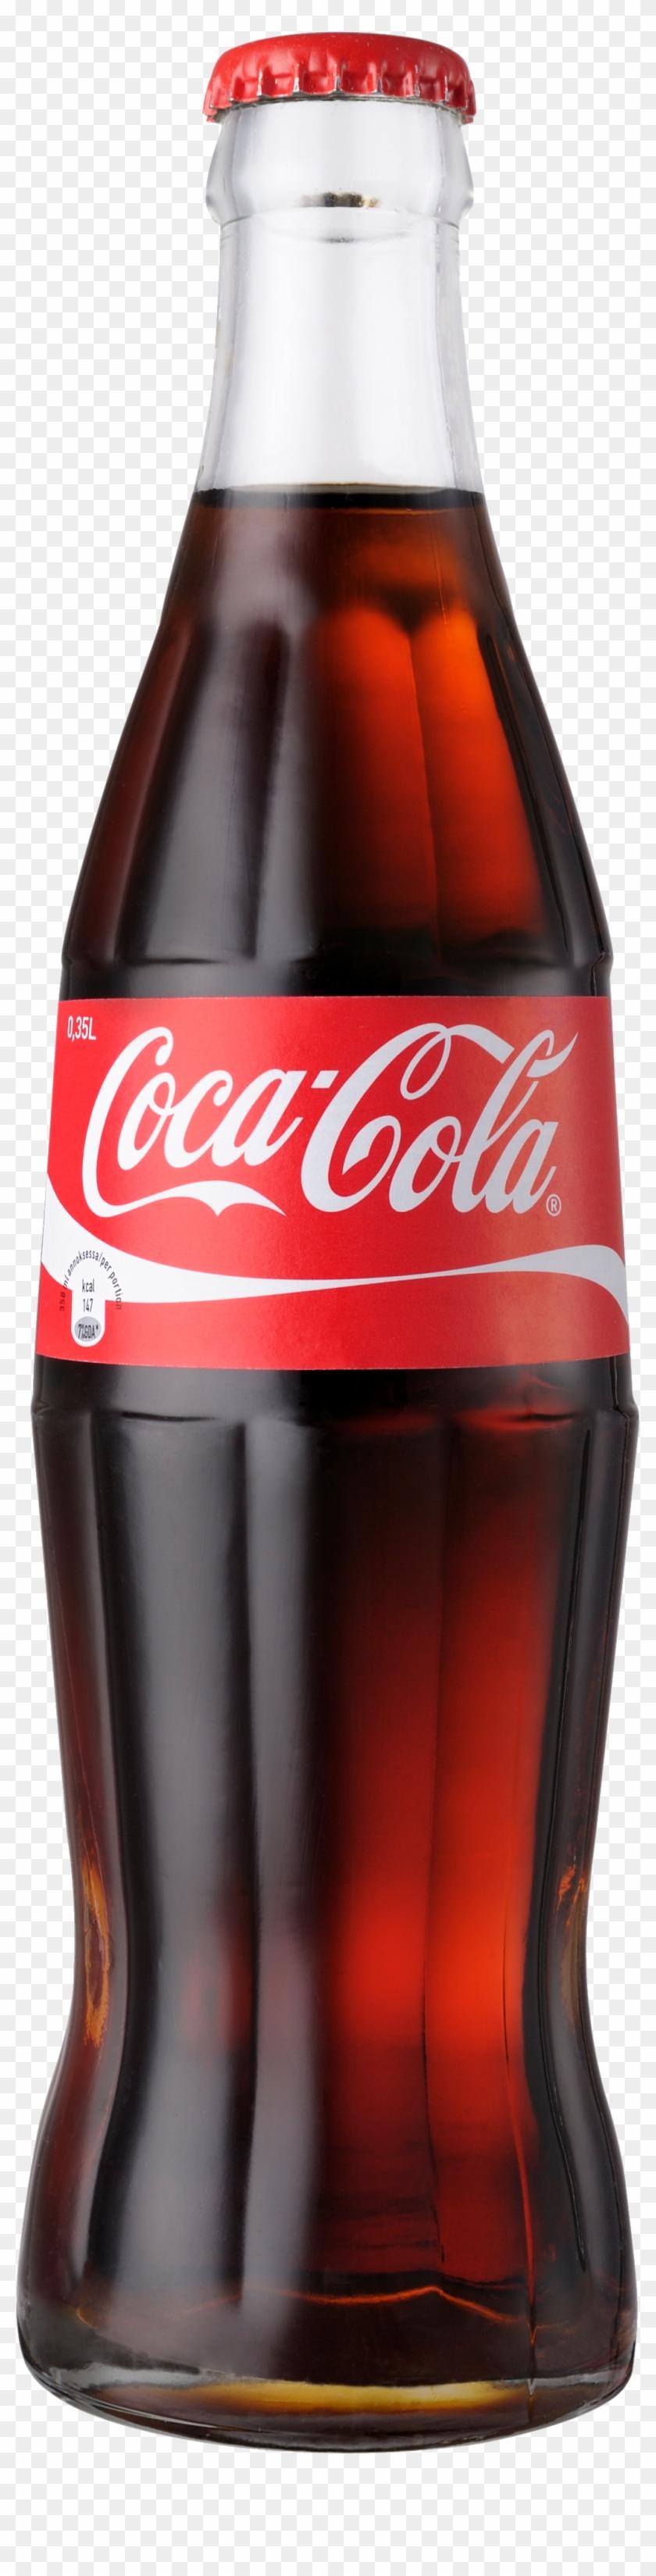 Pepsi bottles dating Numbers seen